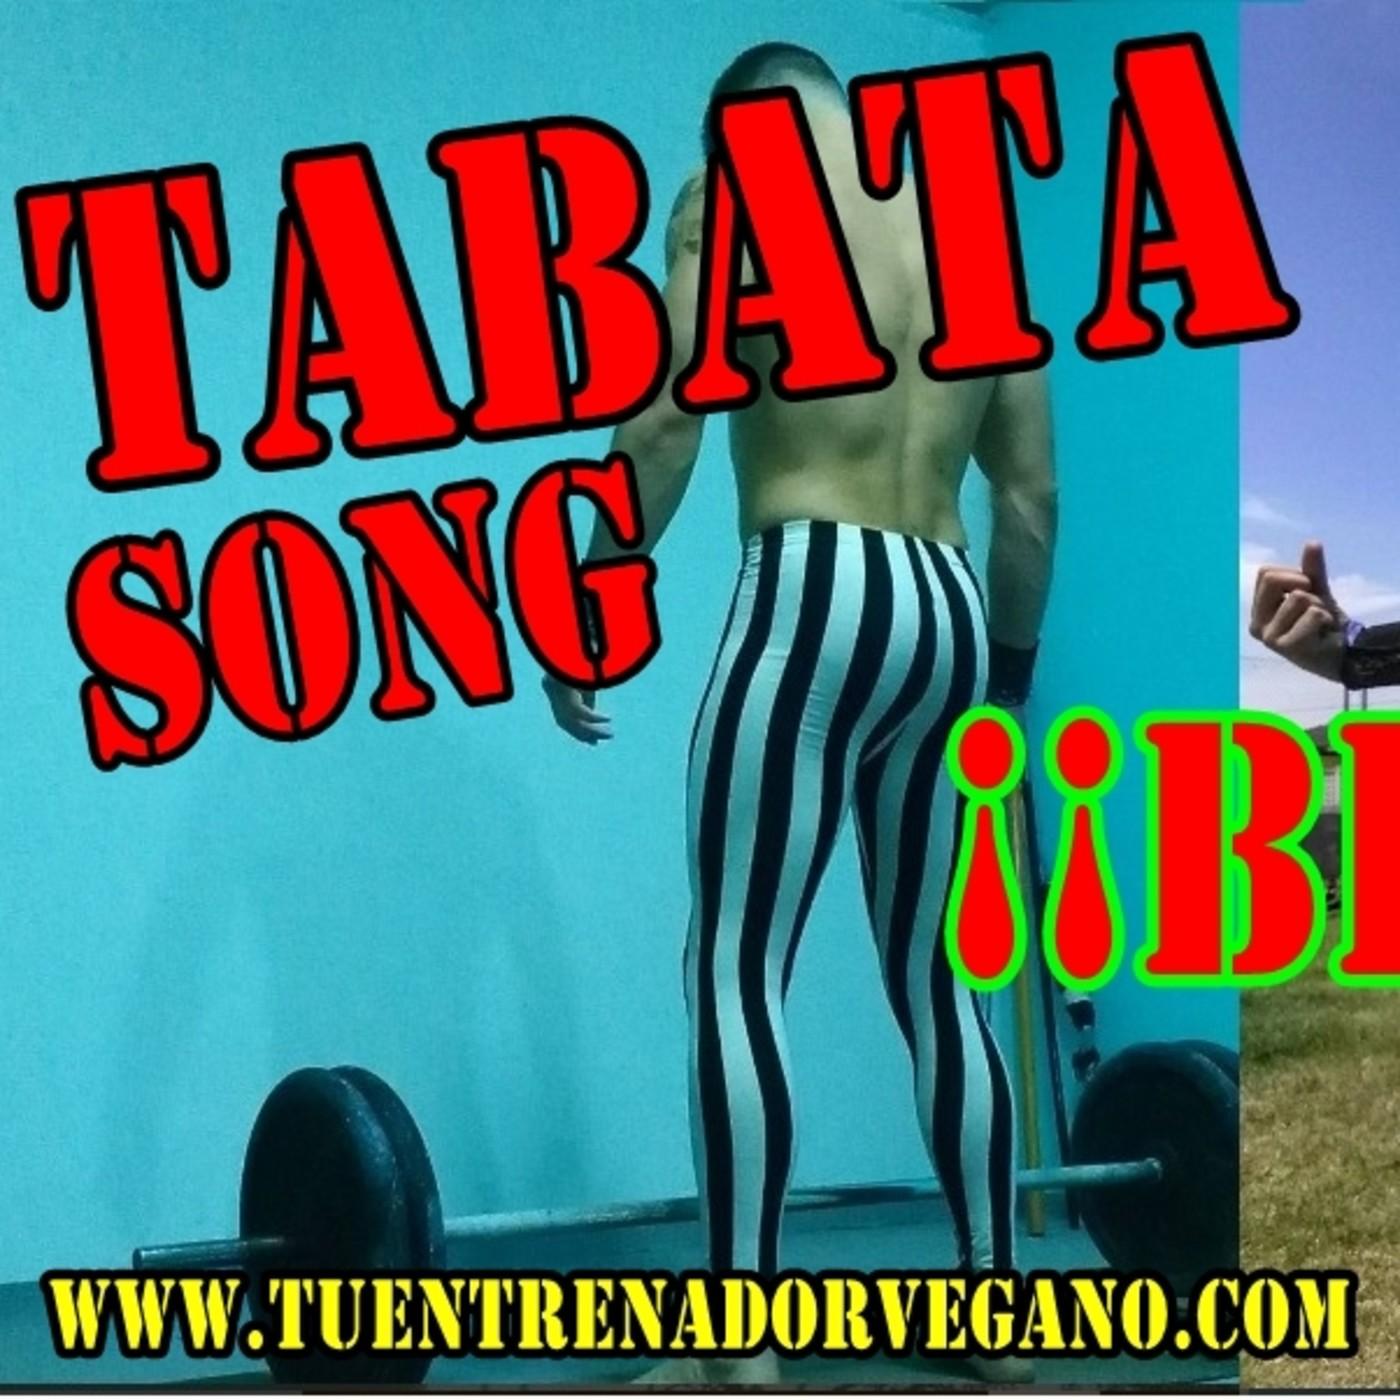 Canción tabata bestial / beast mode tabata song en Radio tu